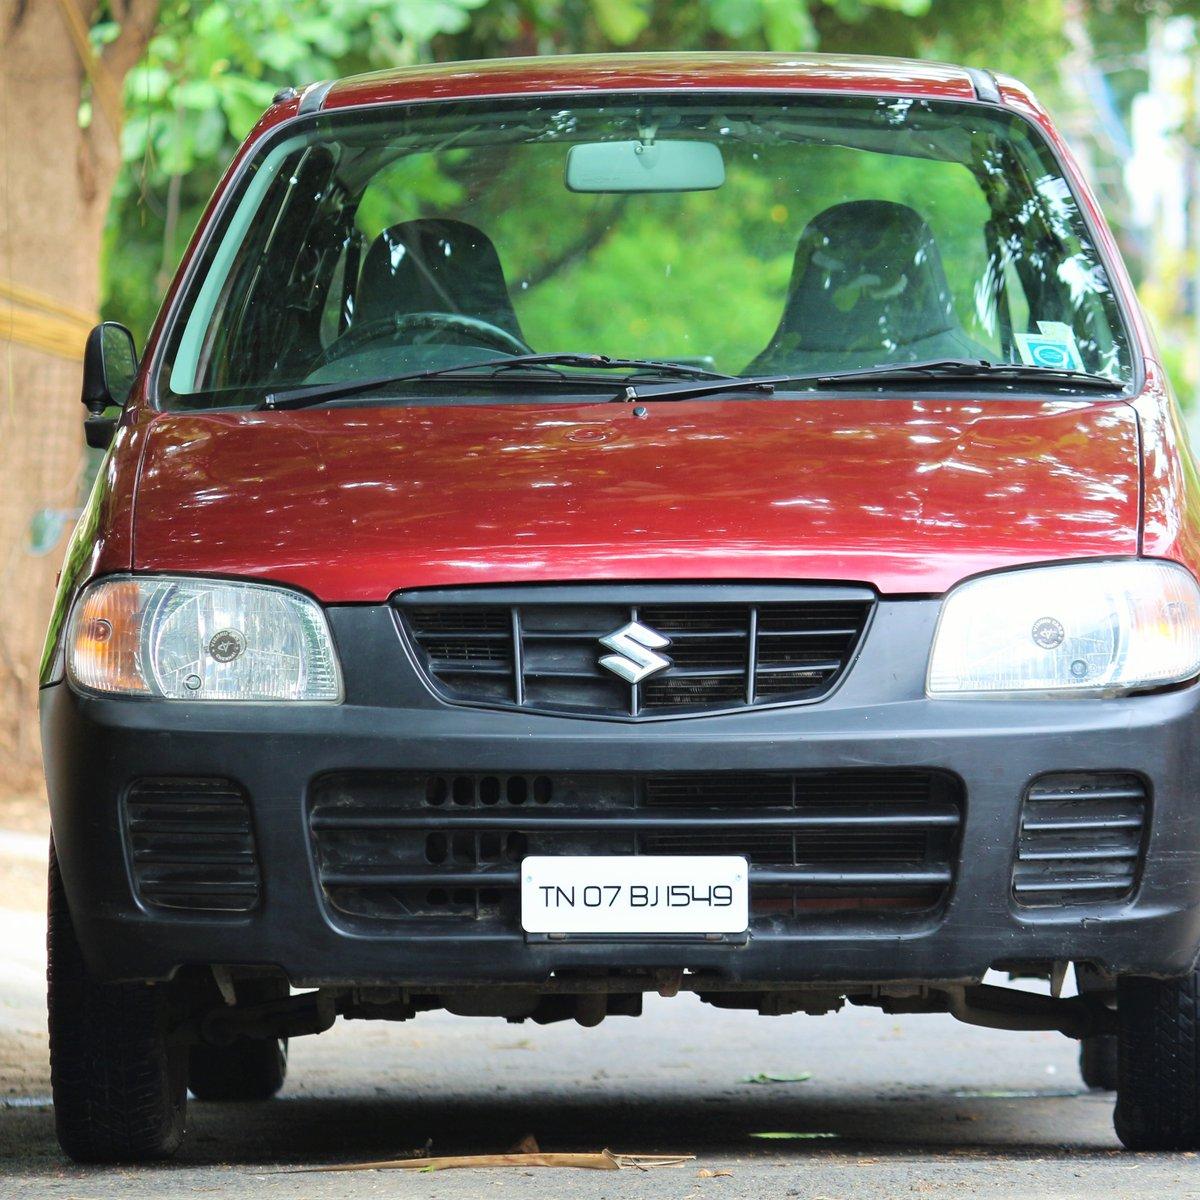 Alto for sale  #Sales #alto #car pic.twitter.com/MEqIvdHEG8